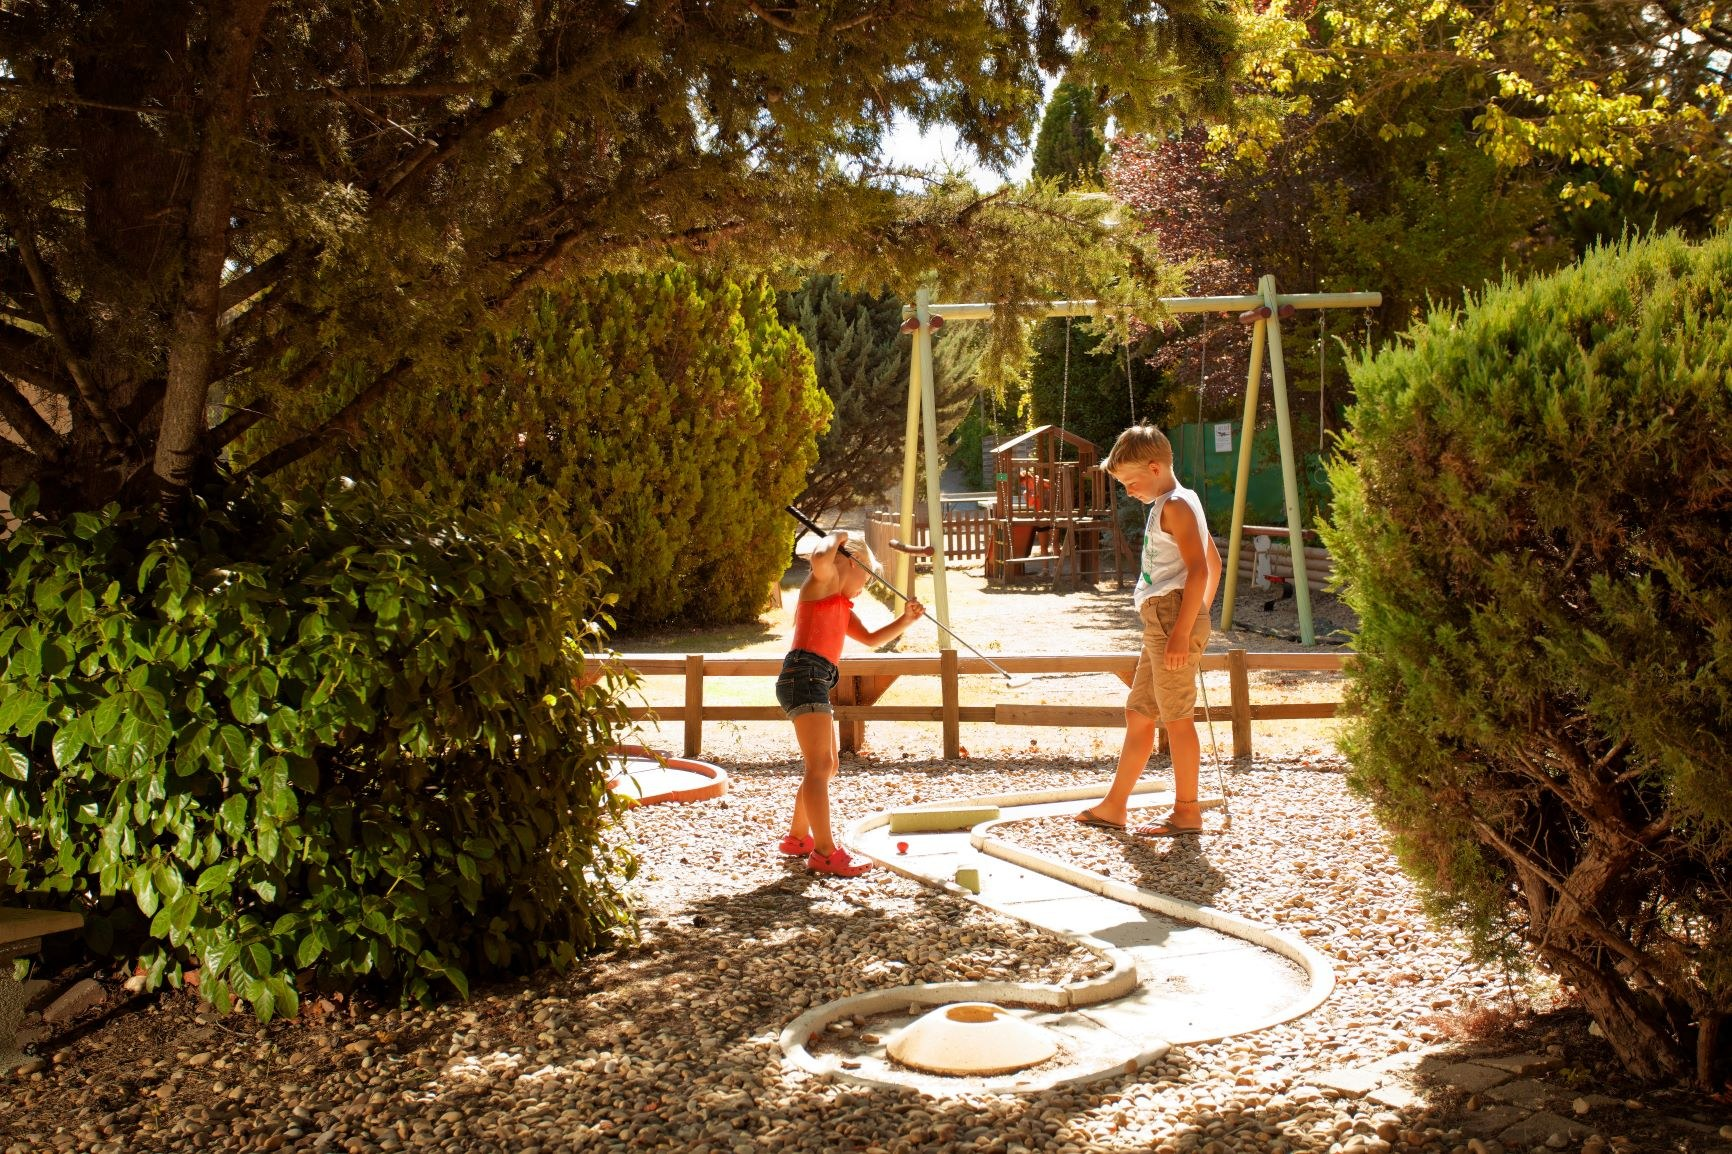 000594 camping de l olivier - junas - photo Aspheries